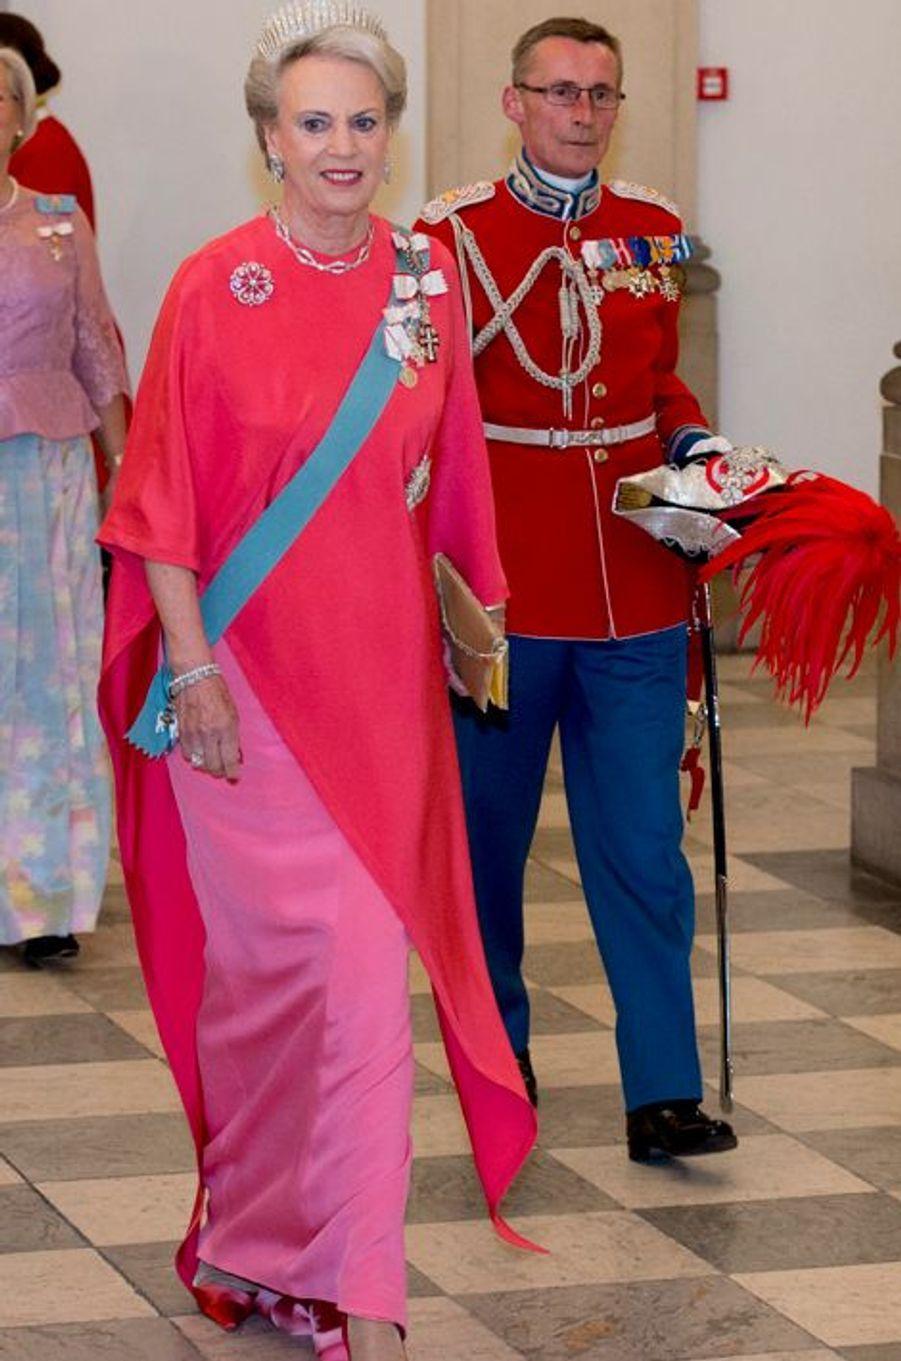 La princesse Benedickte de Danemark à Copenhague, le 15 avril 2015